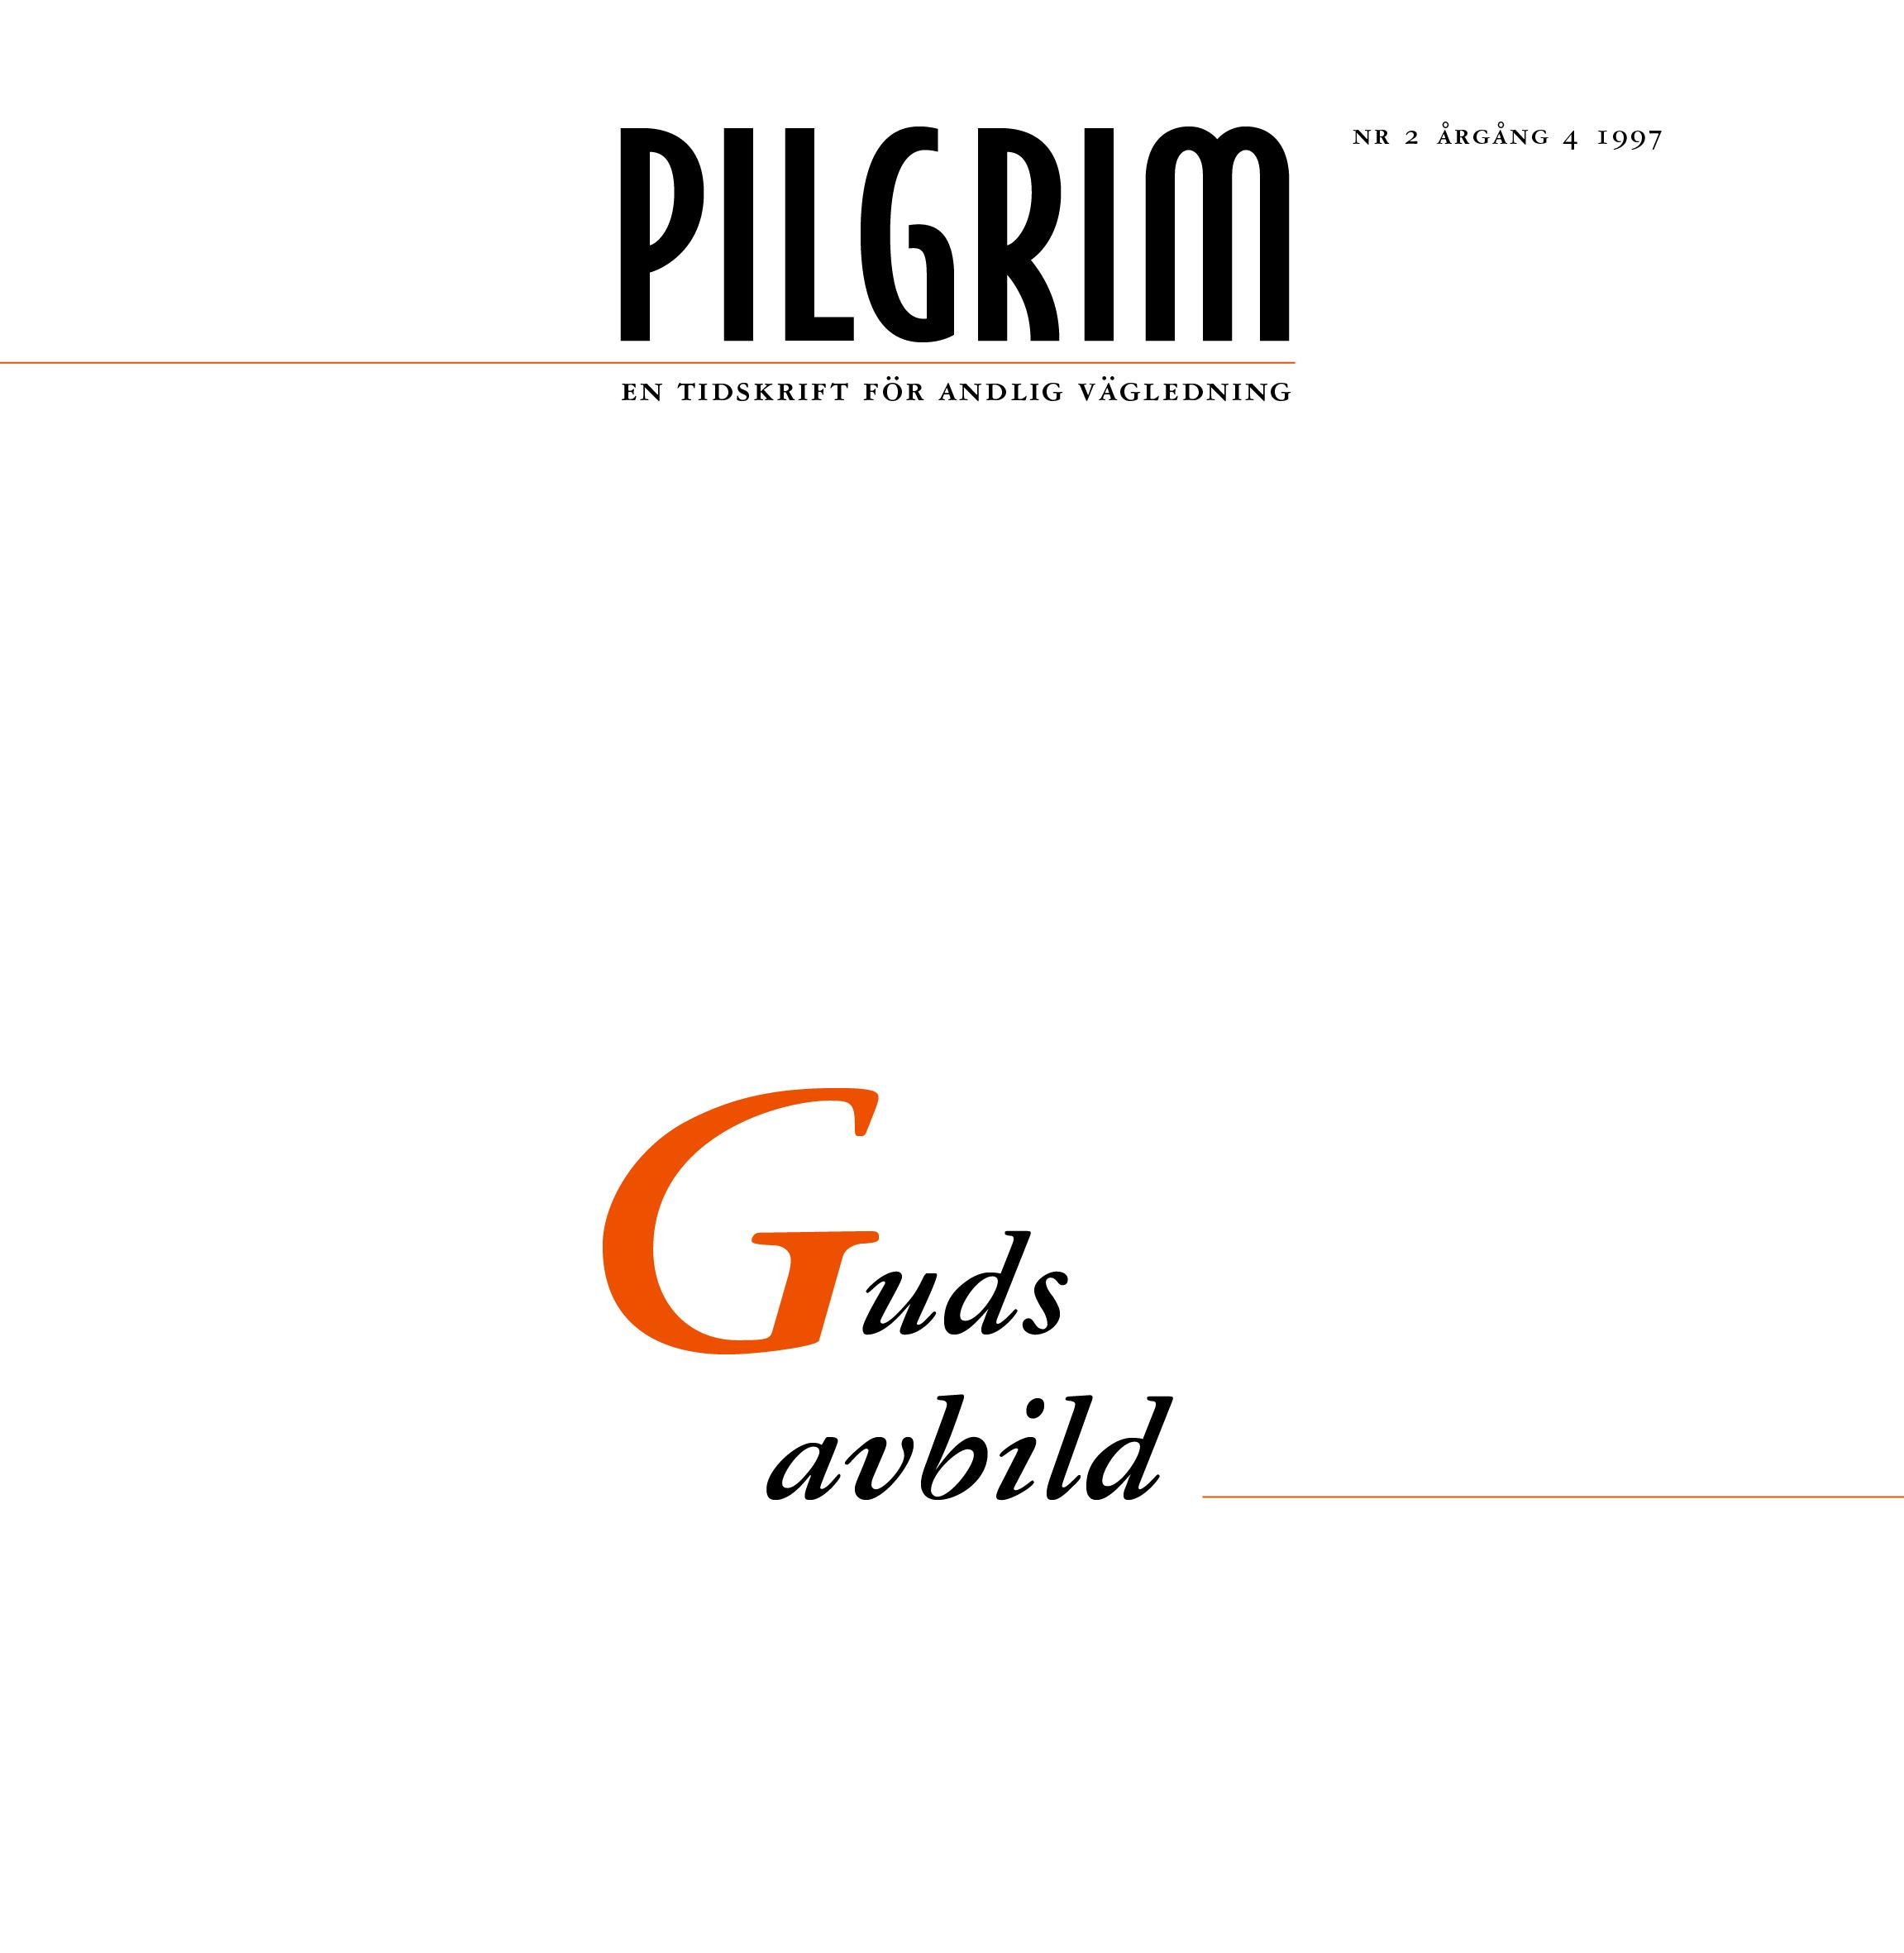 Pilgrim frams 1997-2